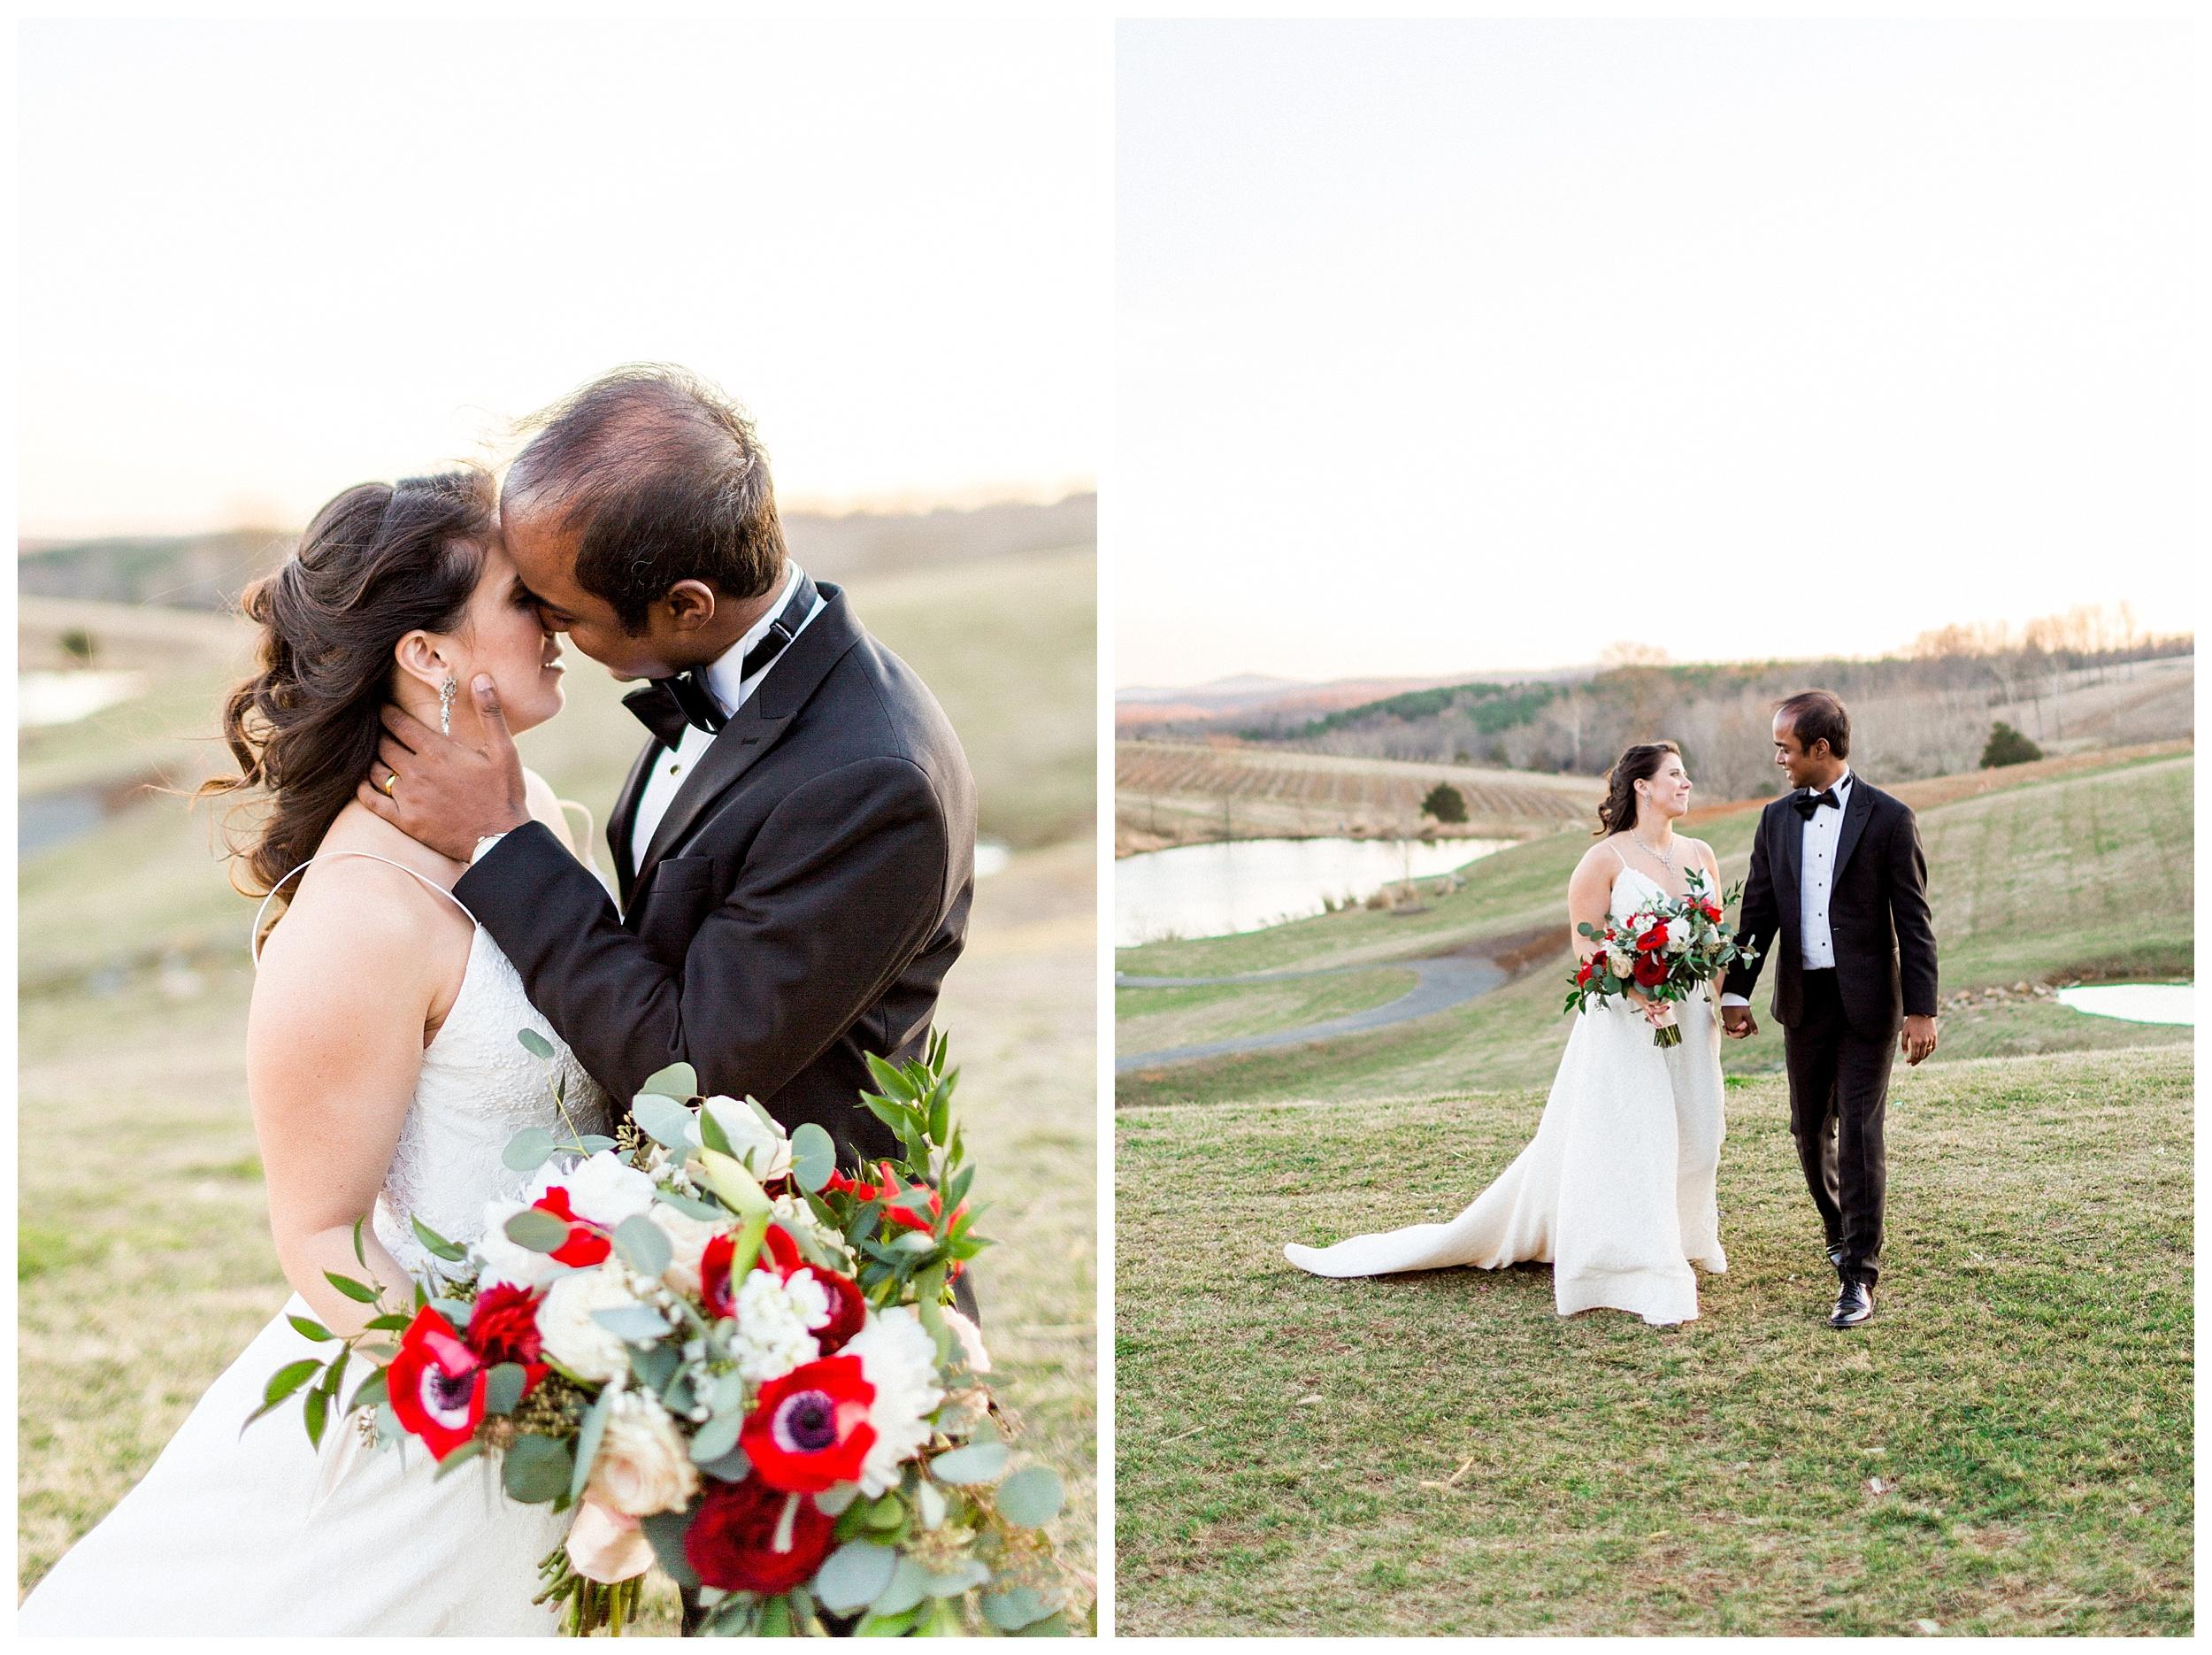 Stone Tower Winery Wedding | Virginia Winter Wedding | VA Wedding Photographer Kir Tuben_0107.jpg